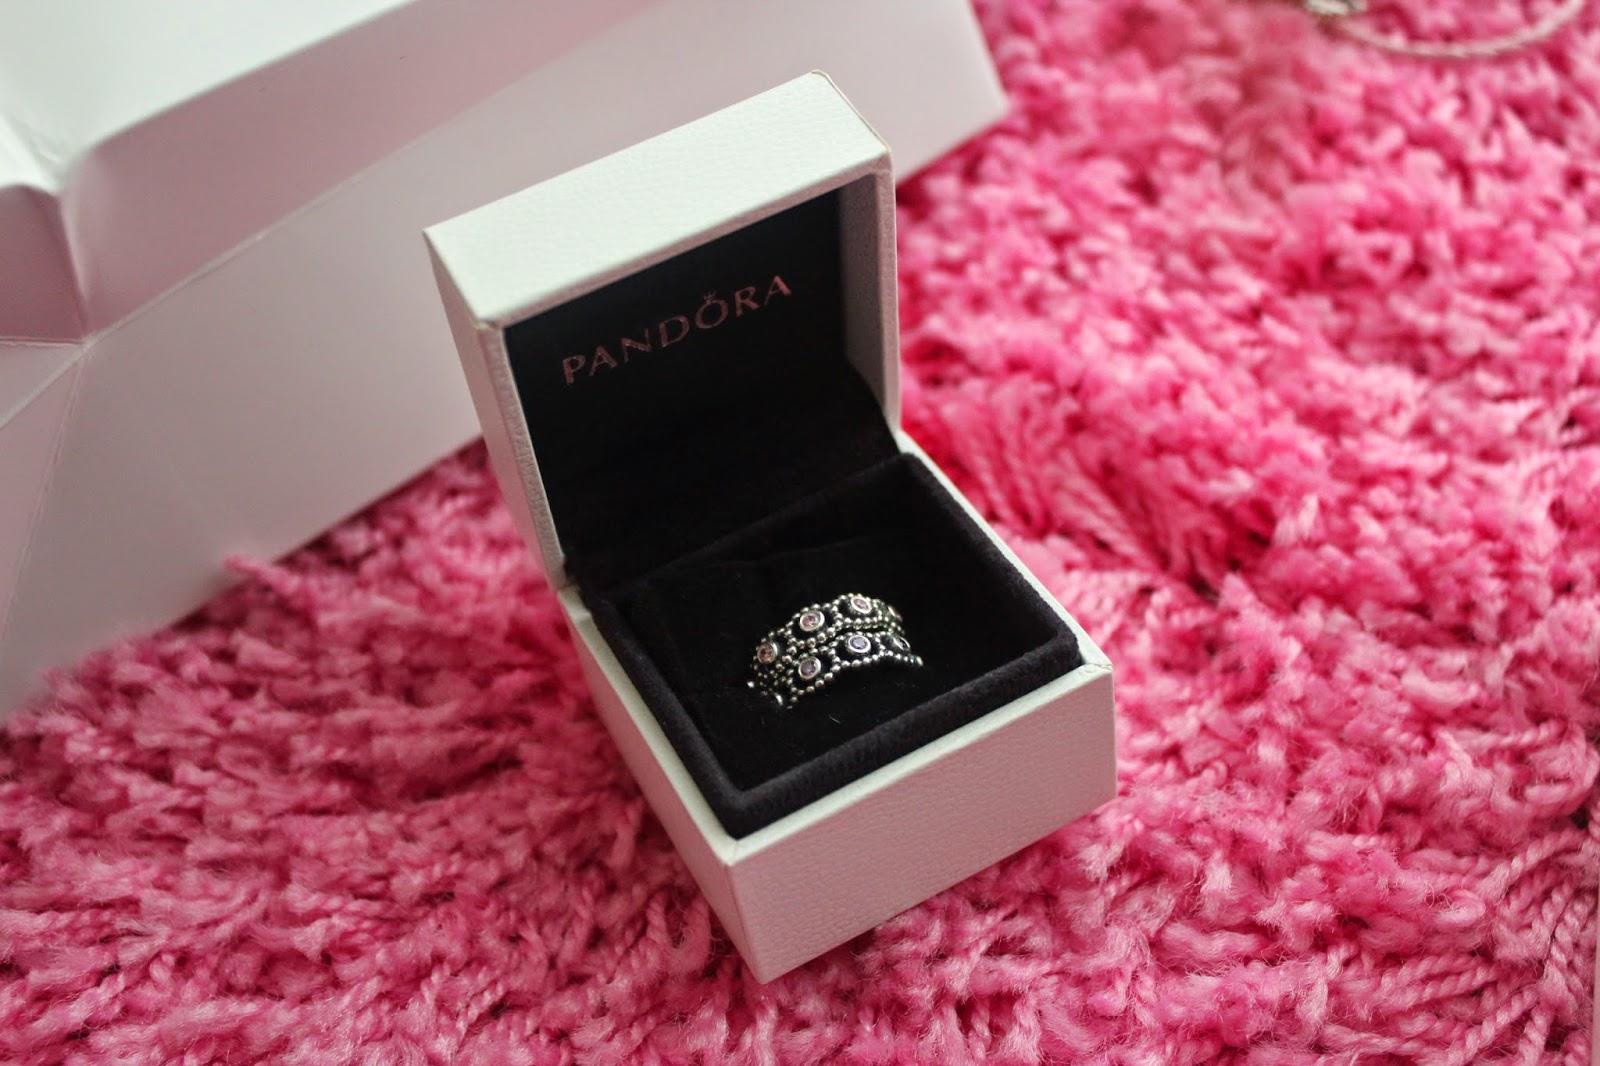 d4cd8efc5 Her Majesty Pink & Purple Rings : http://www.pandora.net/en-us/explore/ products/rings/190881PCZ http://www.pandora.net/en-us/explore/products/rings/  ...